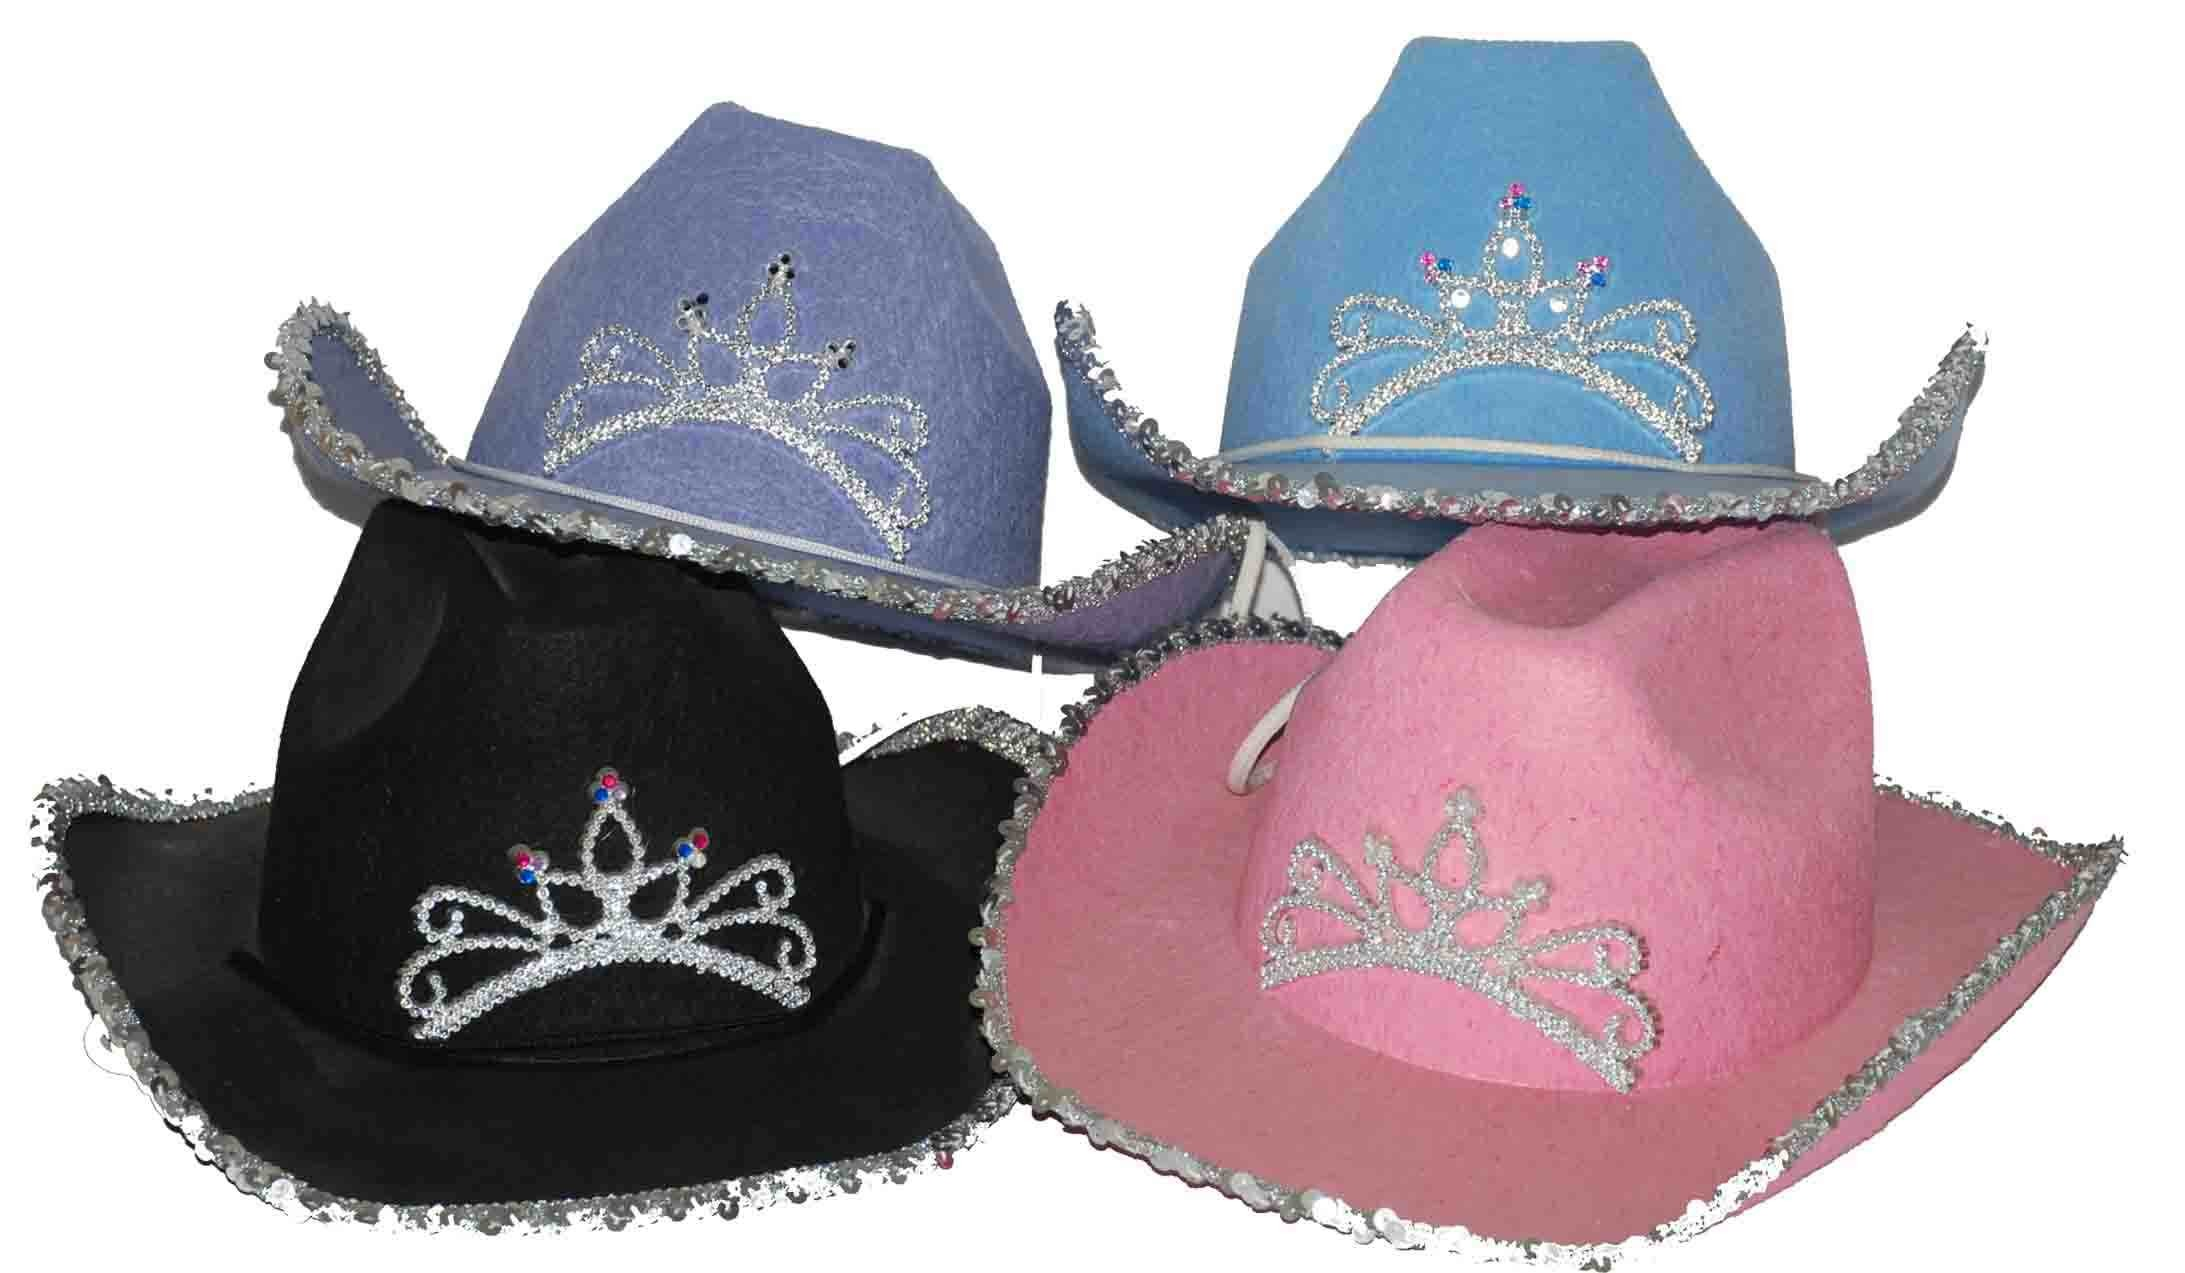 bd6a46b902e8c China Princess Cowgirl Hat (F2009-01) - China Cowgirl Hat